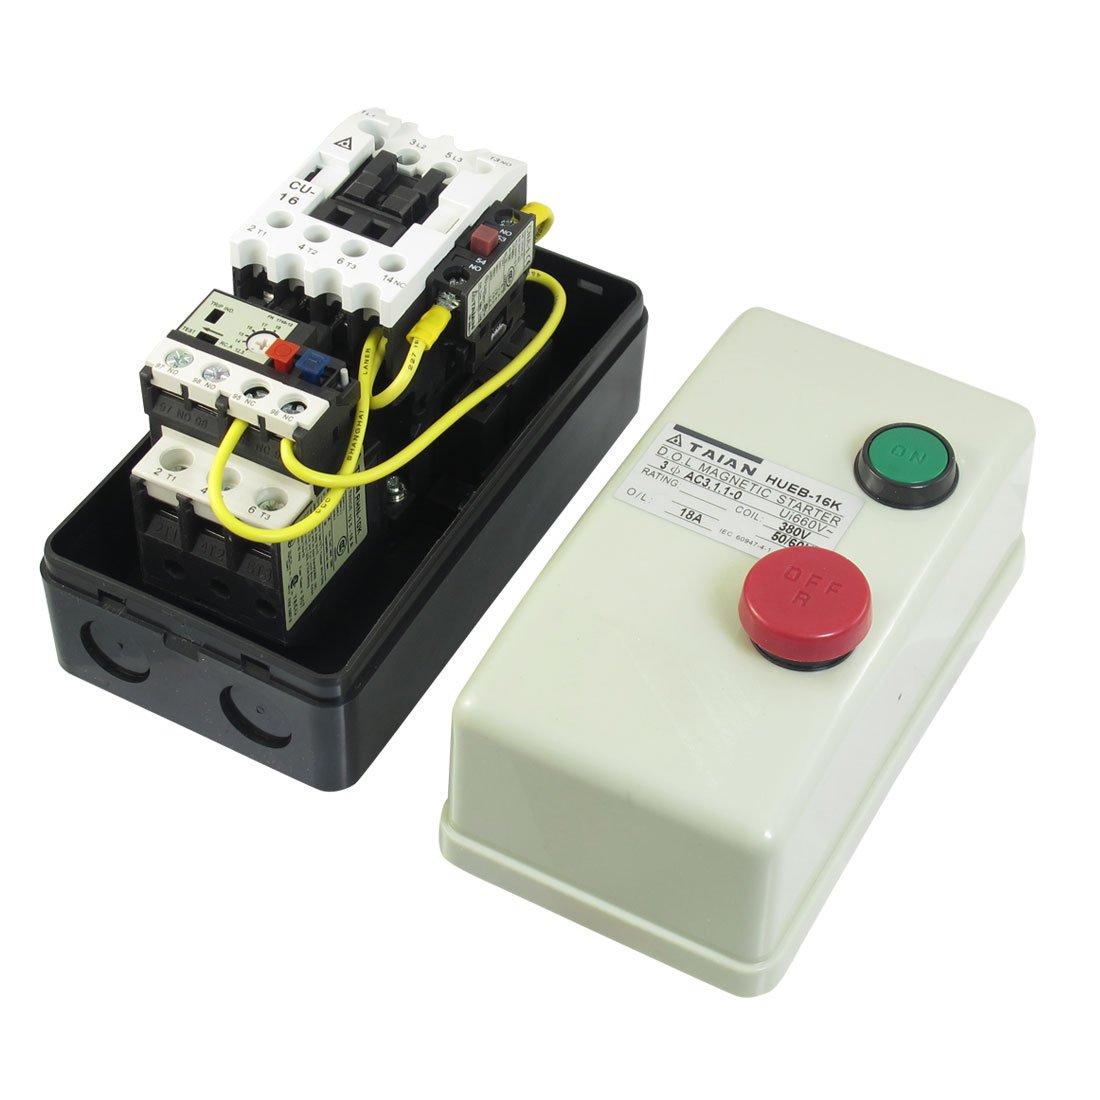 IIVVERR On Off Switch Enclosed 3 Pole Motor Magnetic Starter 380V Coil 12.5-18A (Encendido Apague el interruptor del motor de 3 polos del arrancador magnético 380V Bobina 12.5-18A